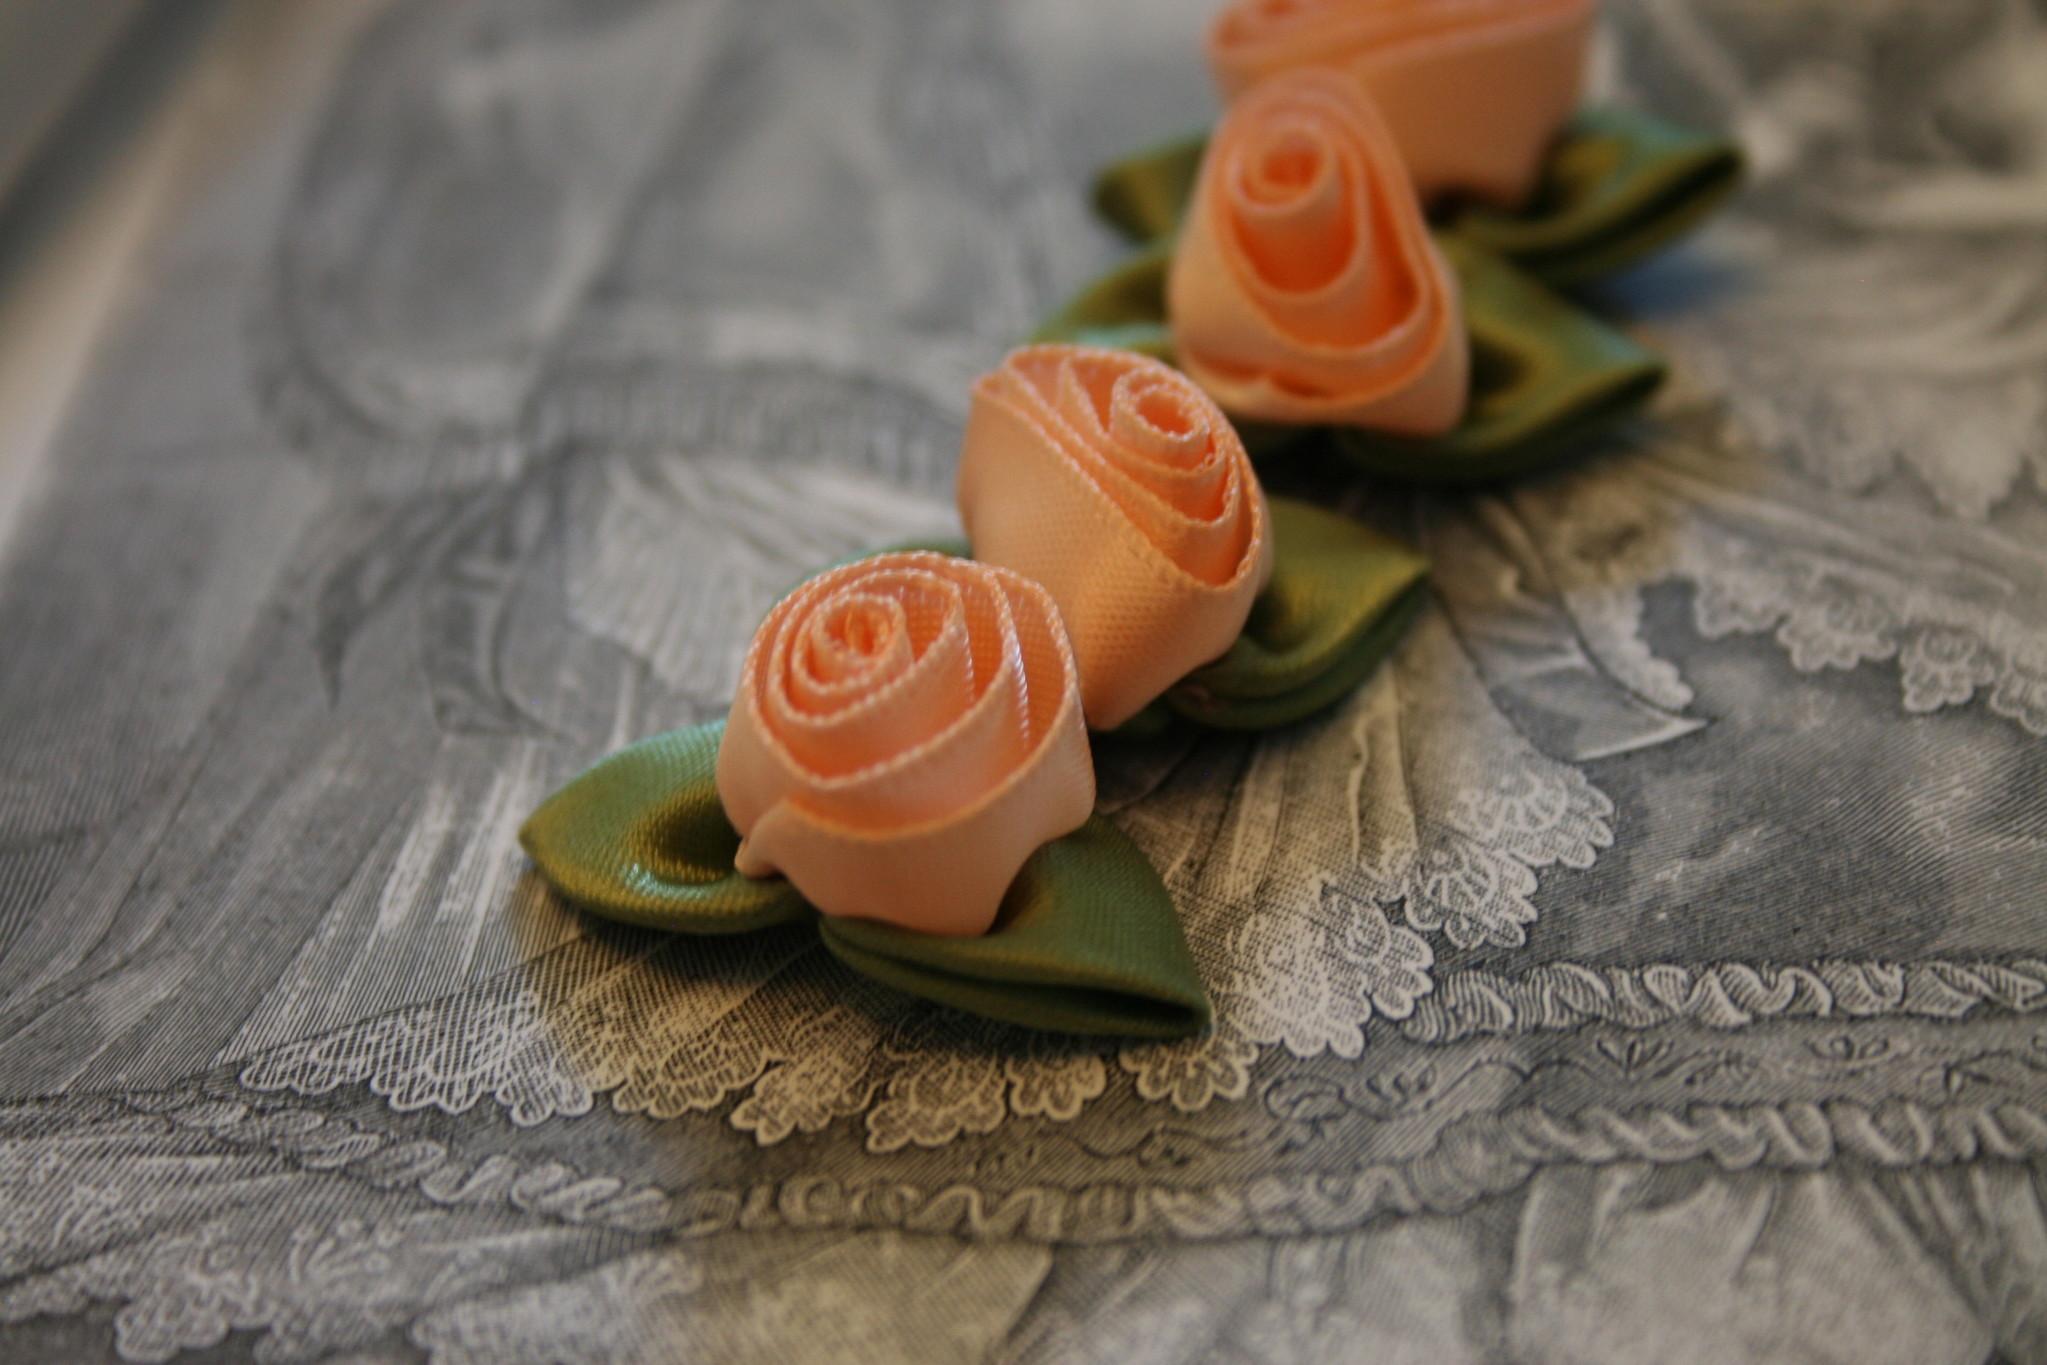 Gutermann satin roses.